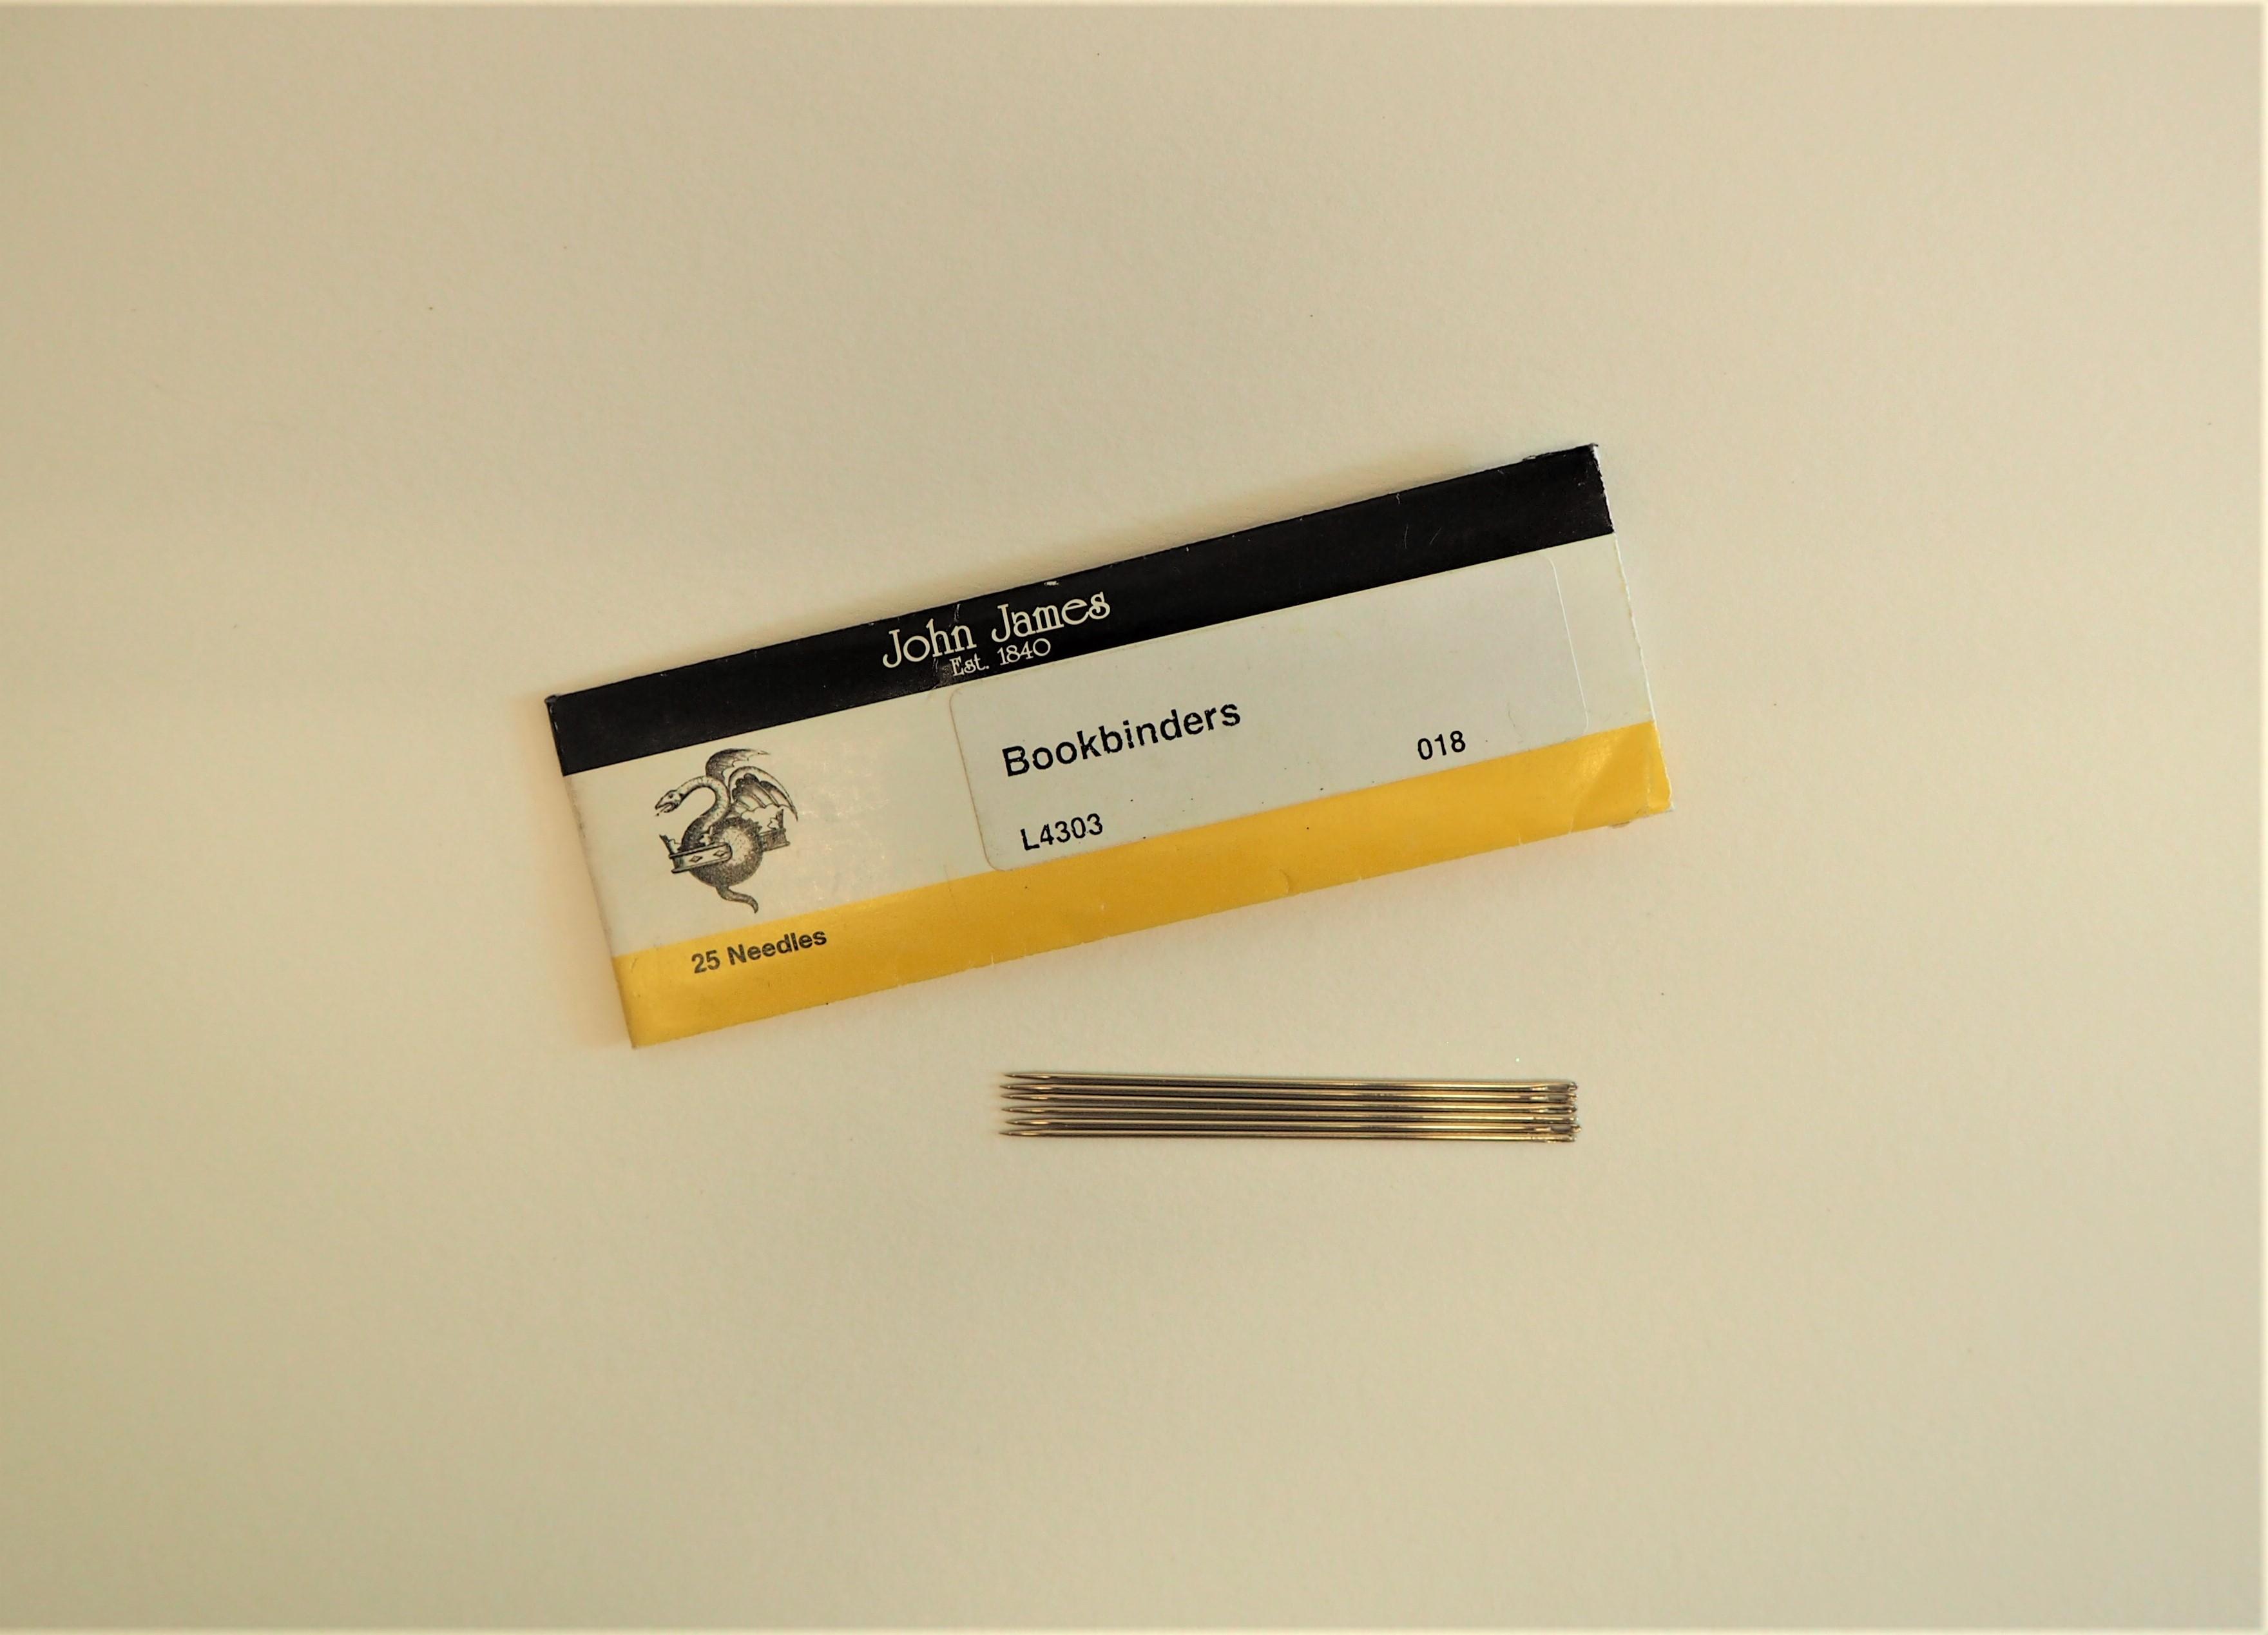 Straight Bookbinding Needles - 5